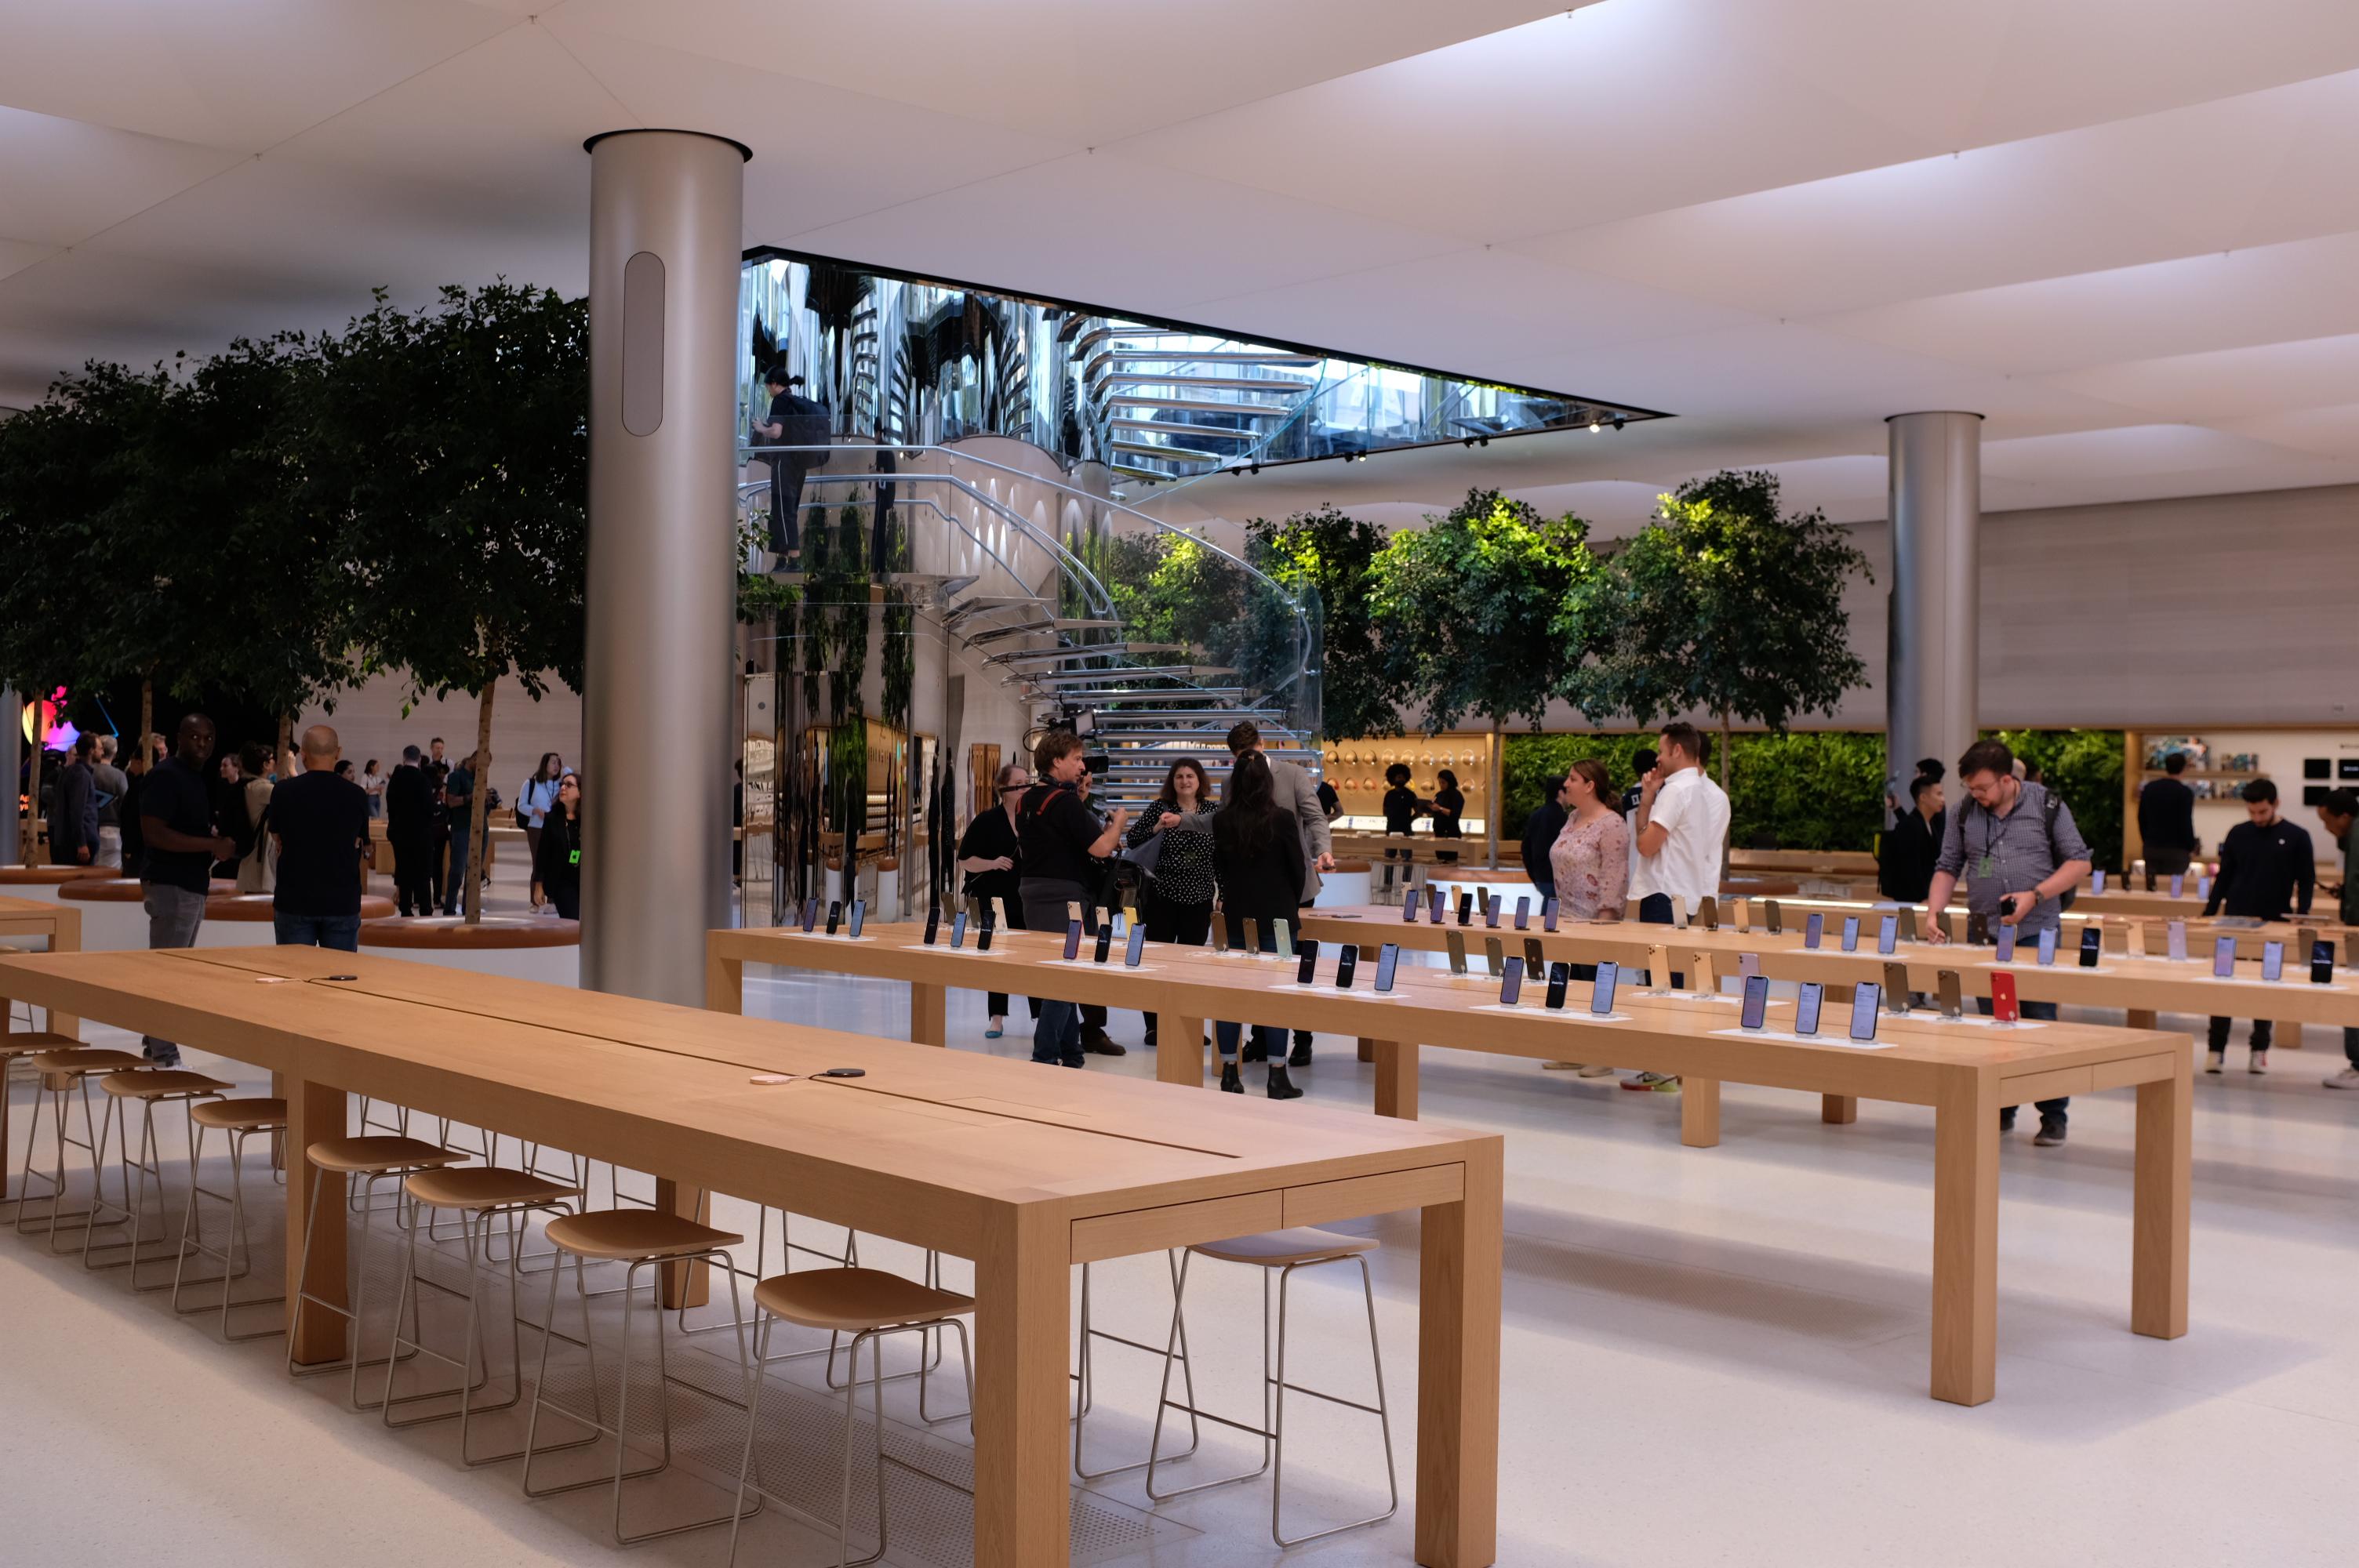 Inside Apple S Reimagined Fifth Ave Store Techcrunch